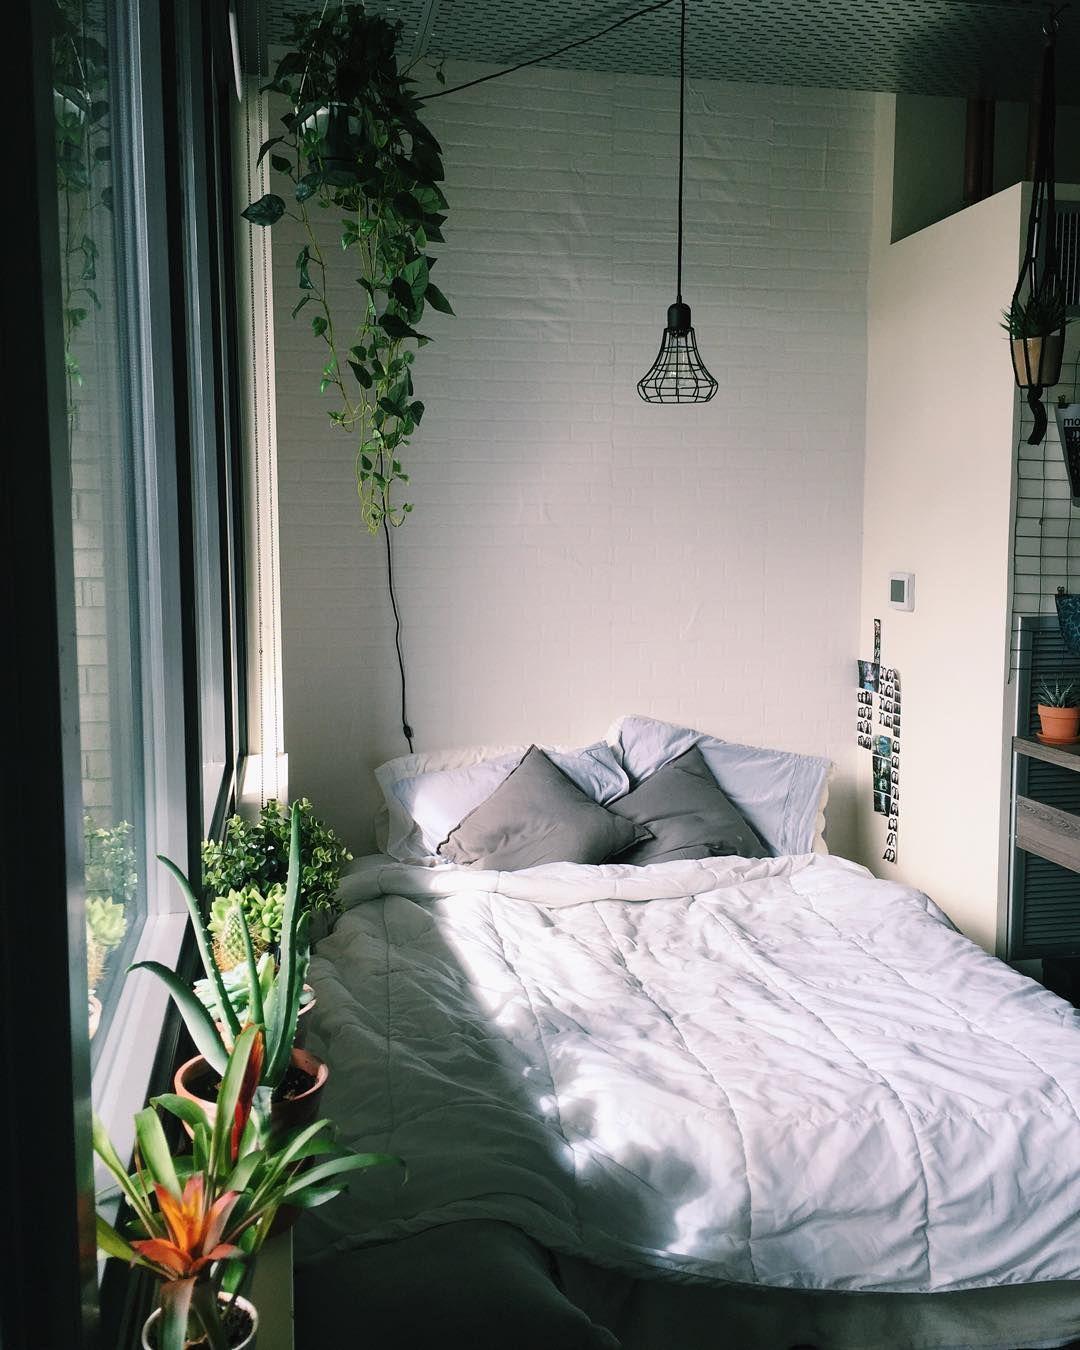 ᴘɪɴᴛᴇʀᴇsᴛ: ʟʏɴɢᴇʟᴀᴜʀᴀ ♛  a  Pinterest  침실, 침실 ...